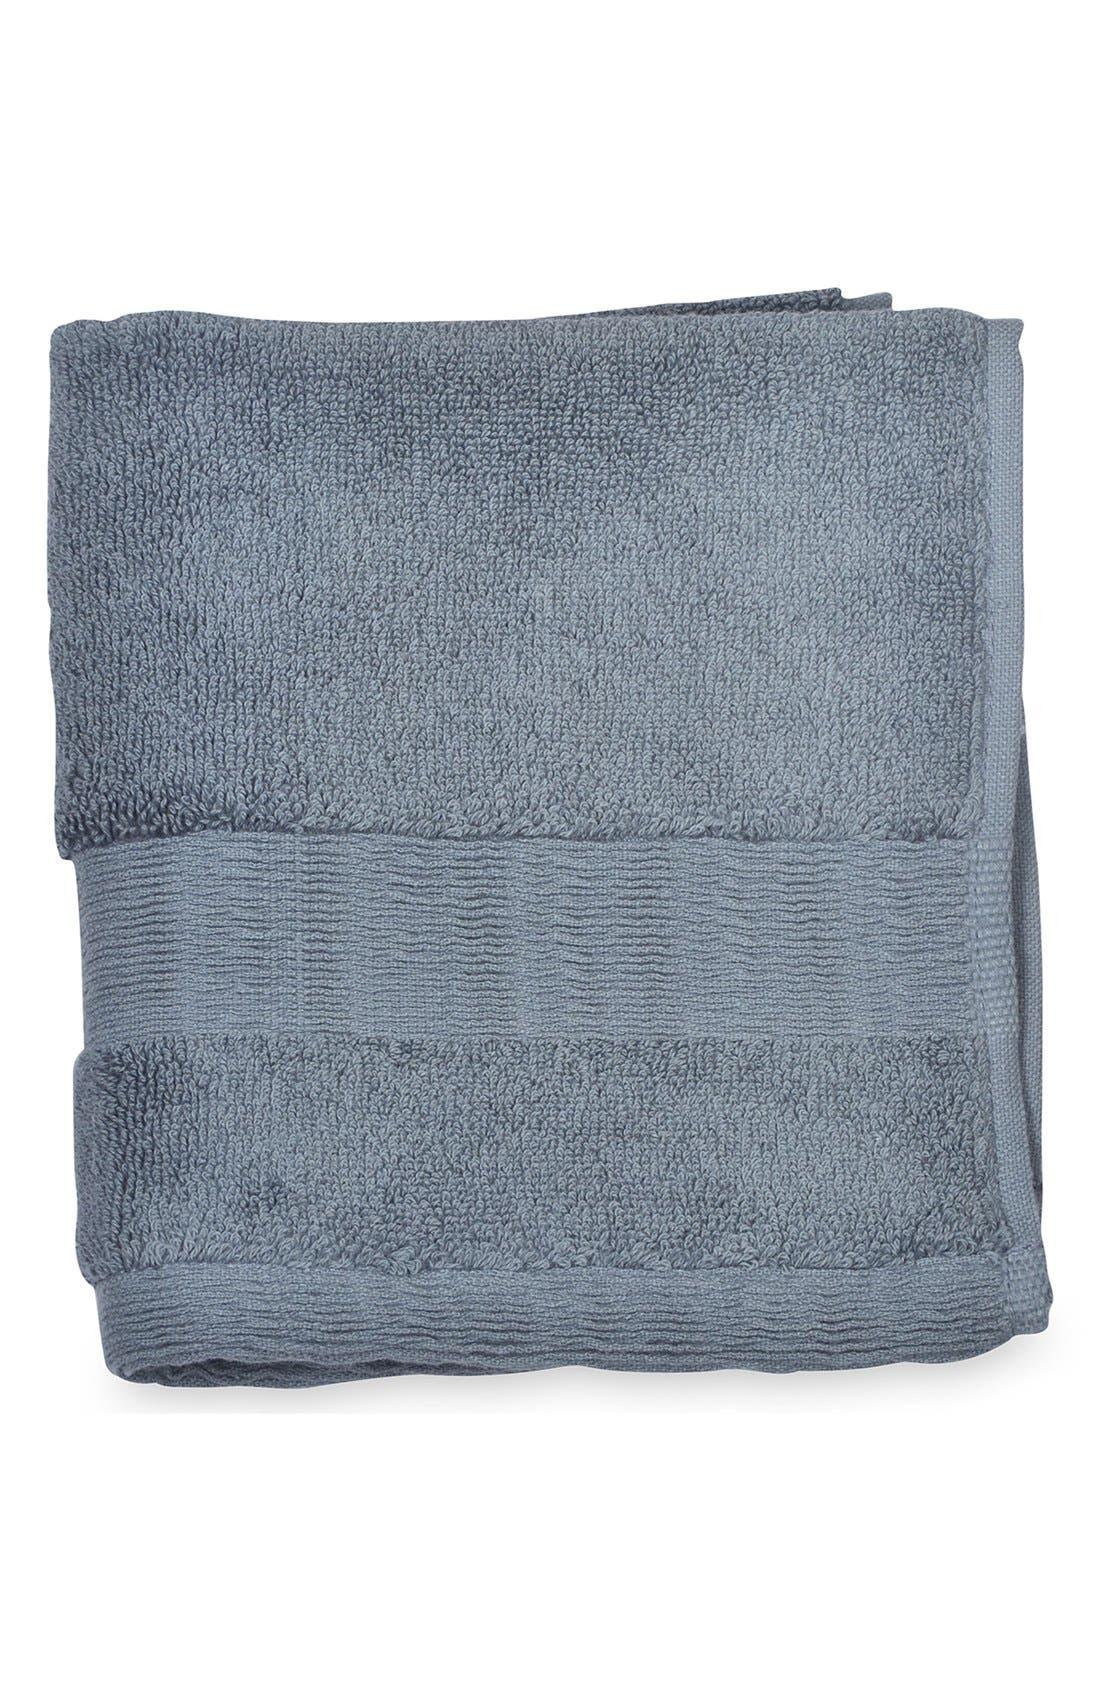 Main Image - DKNY Mercer Wash Towel